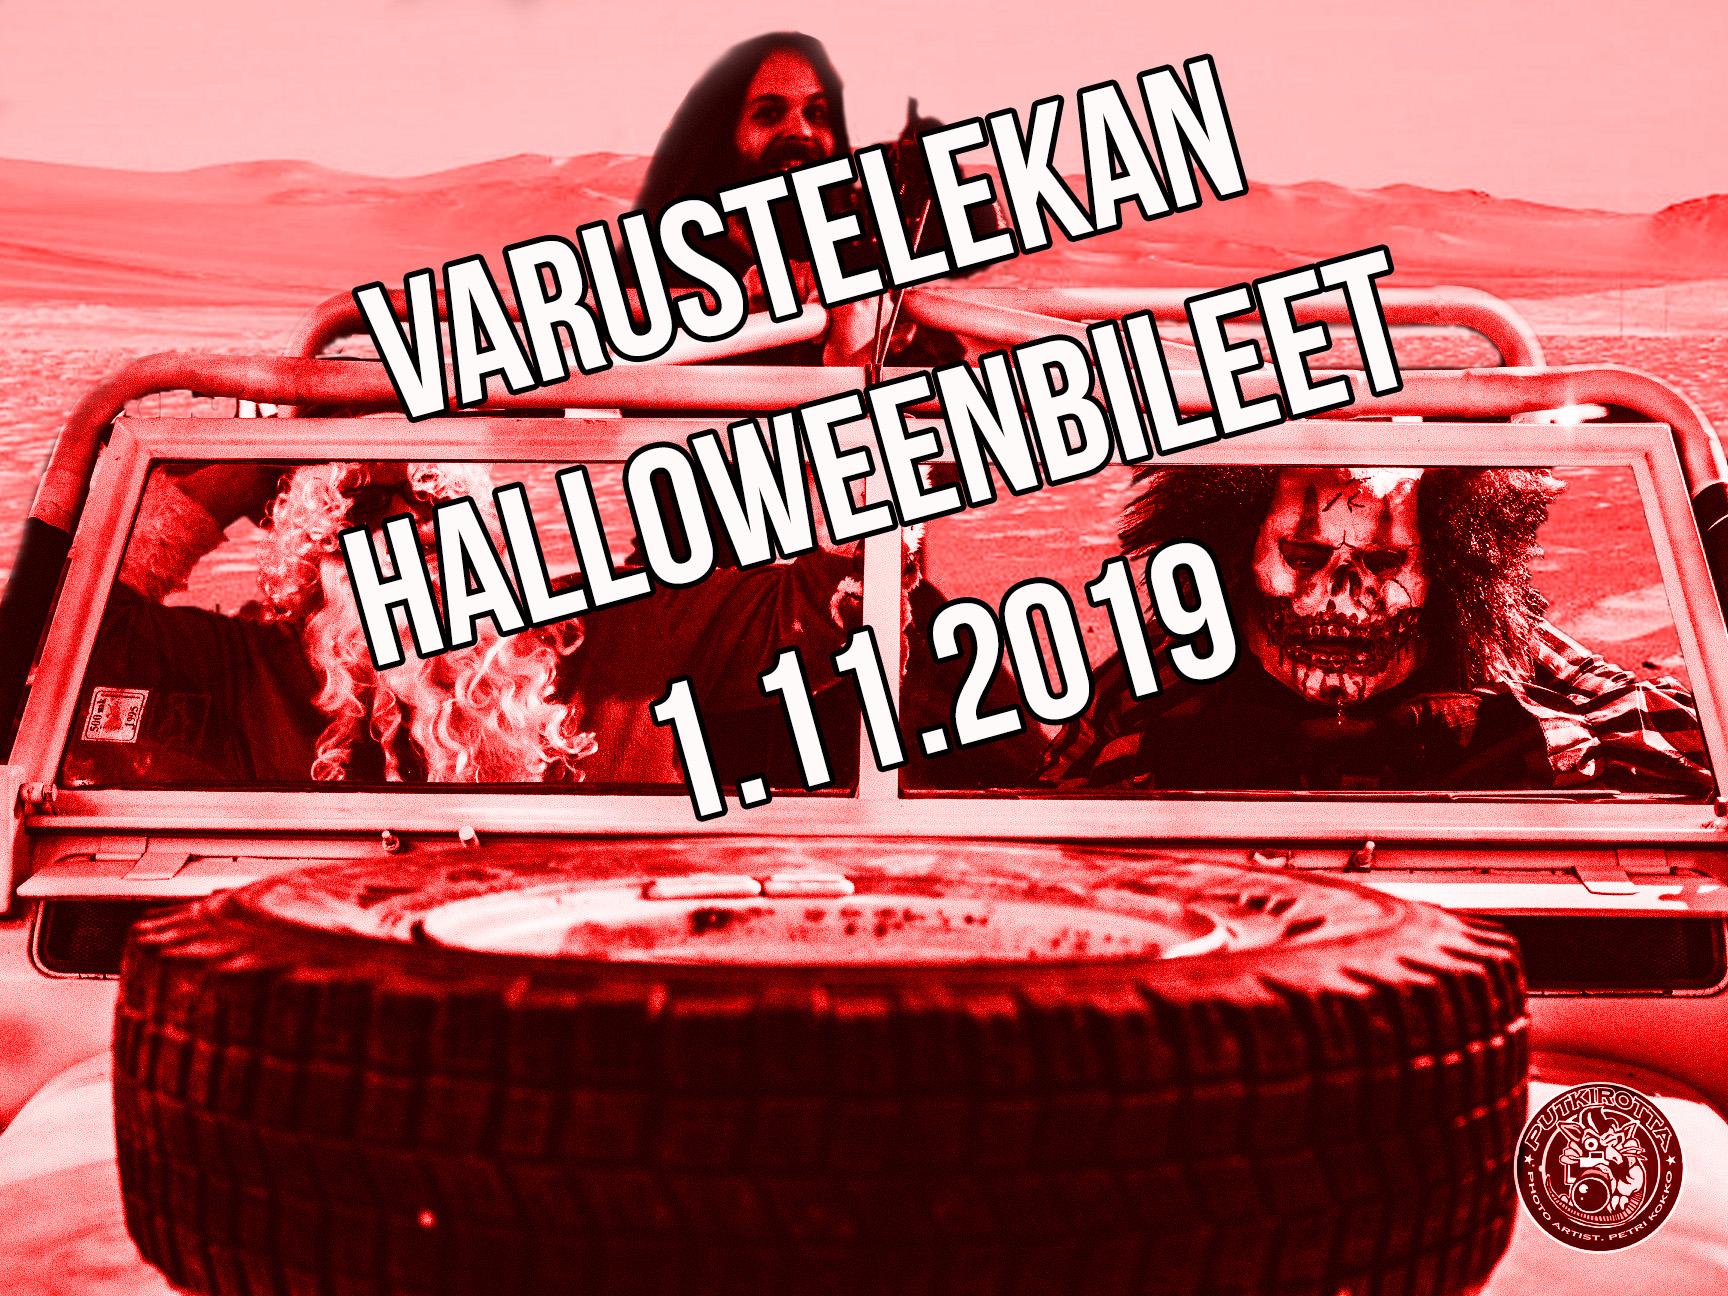 Varustelekan Halloween 01.11.2019